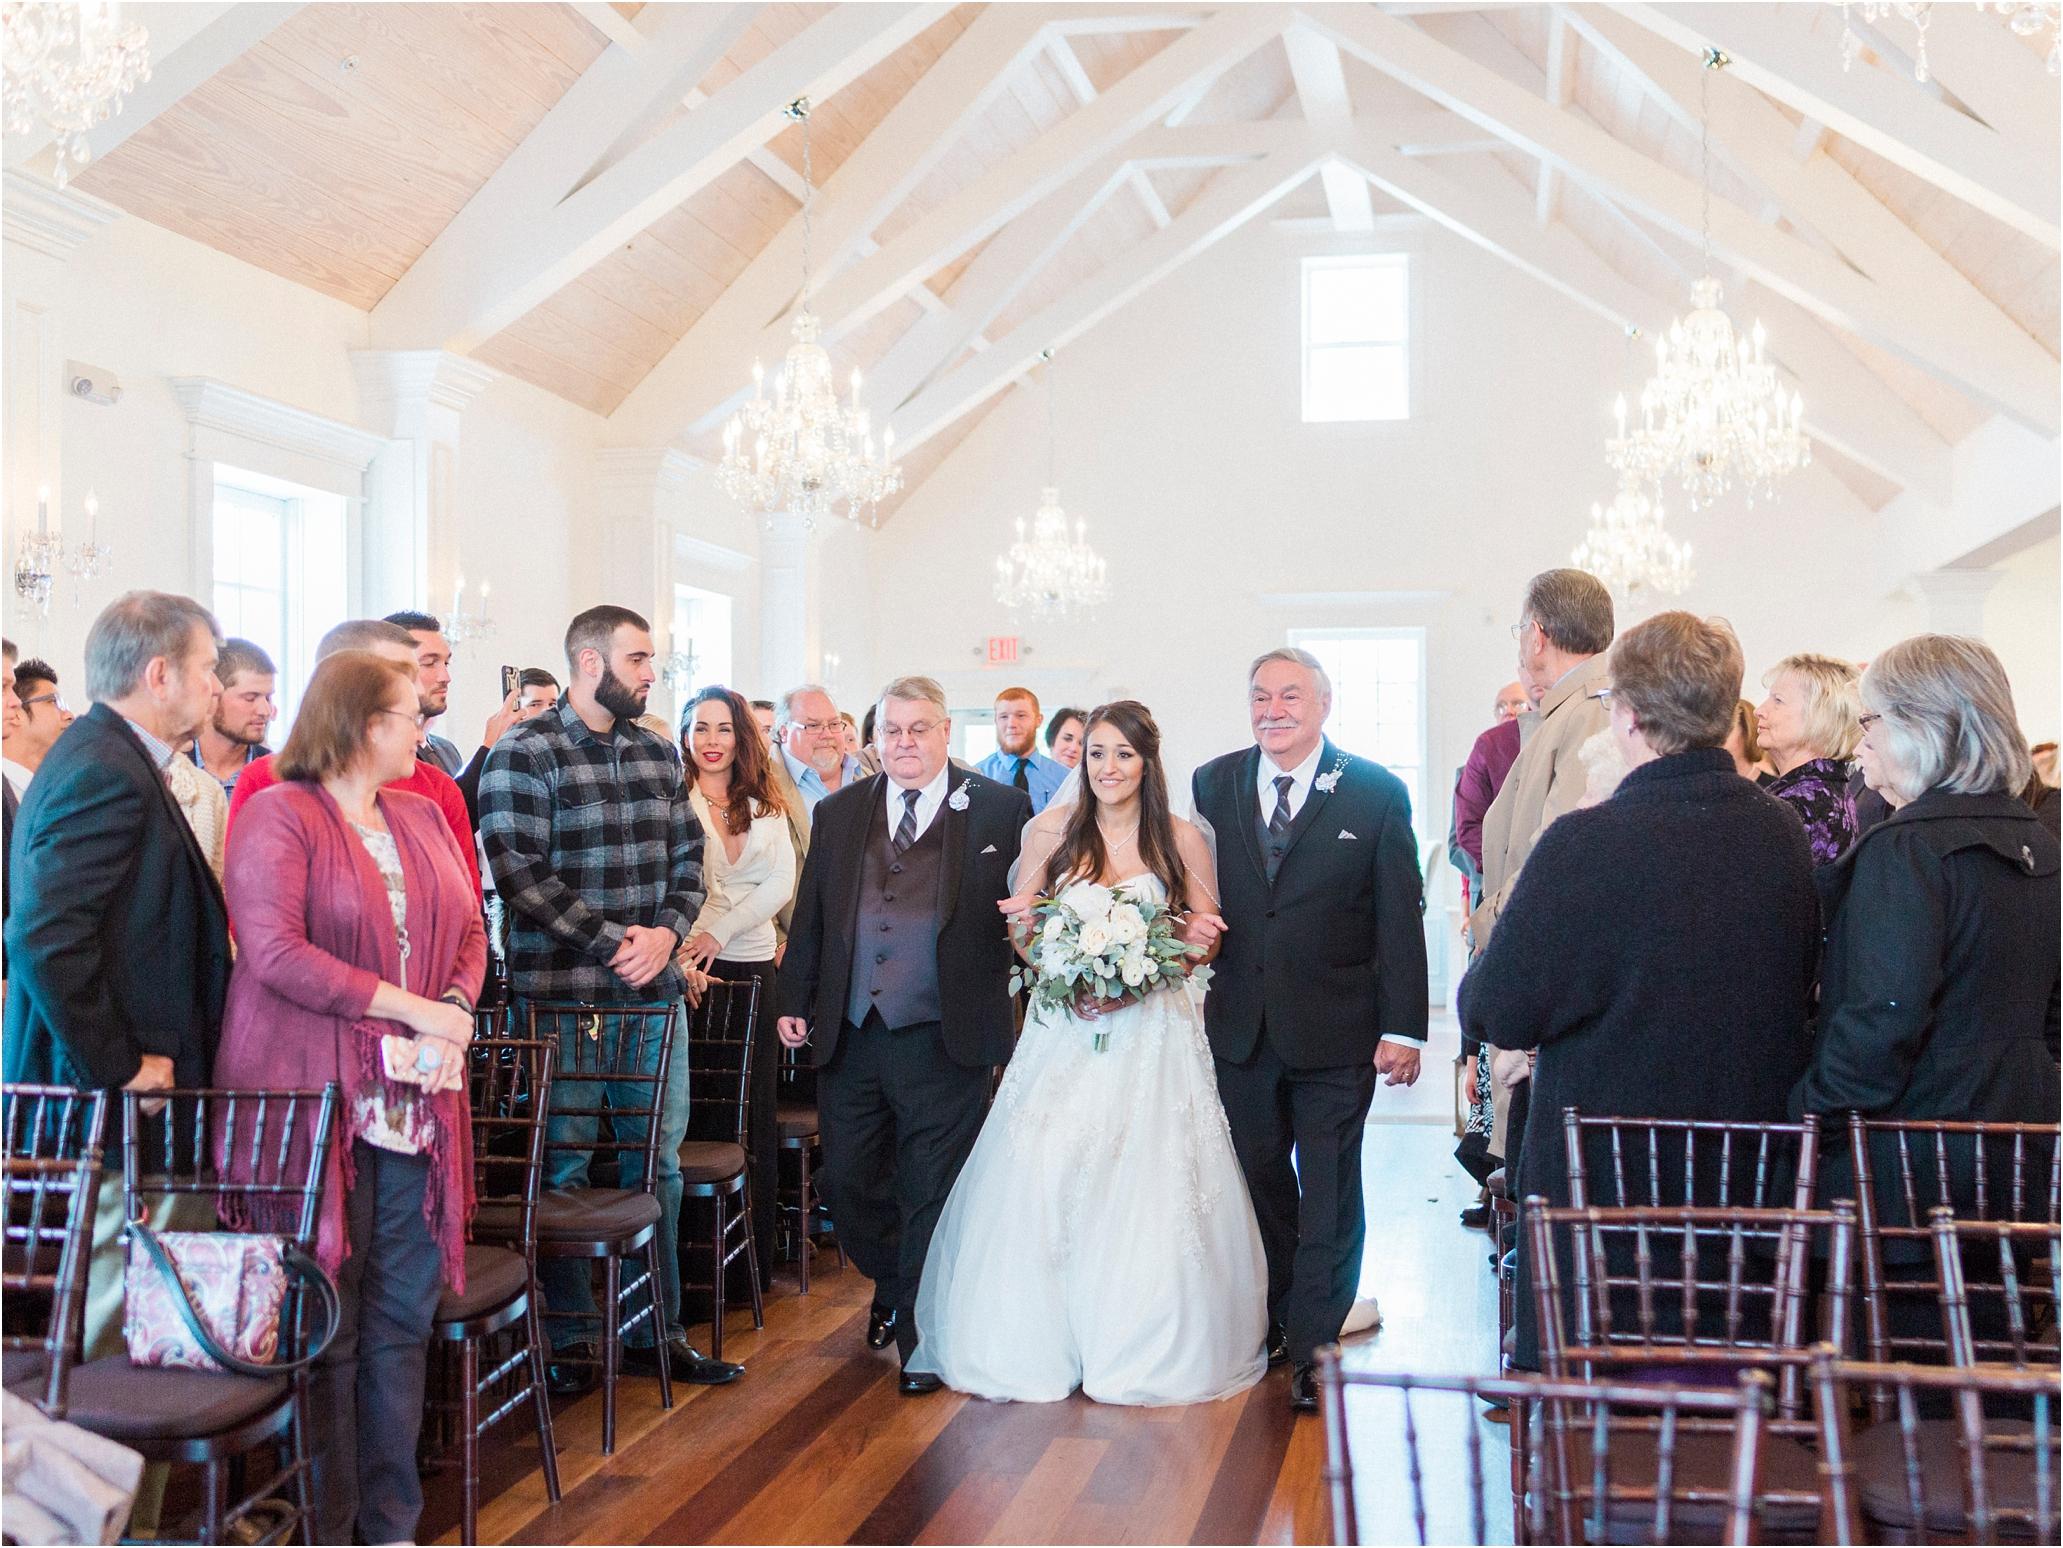 Lisa Silva Photography- Ponte Vedra Beach and Jacksonville, Florida Fine Art Film Wedding Photography- Wedding at The White Room Villa Blanca in St. Augustine, Florida_0045.jpg